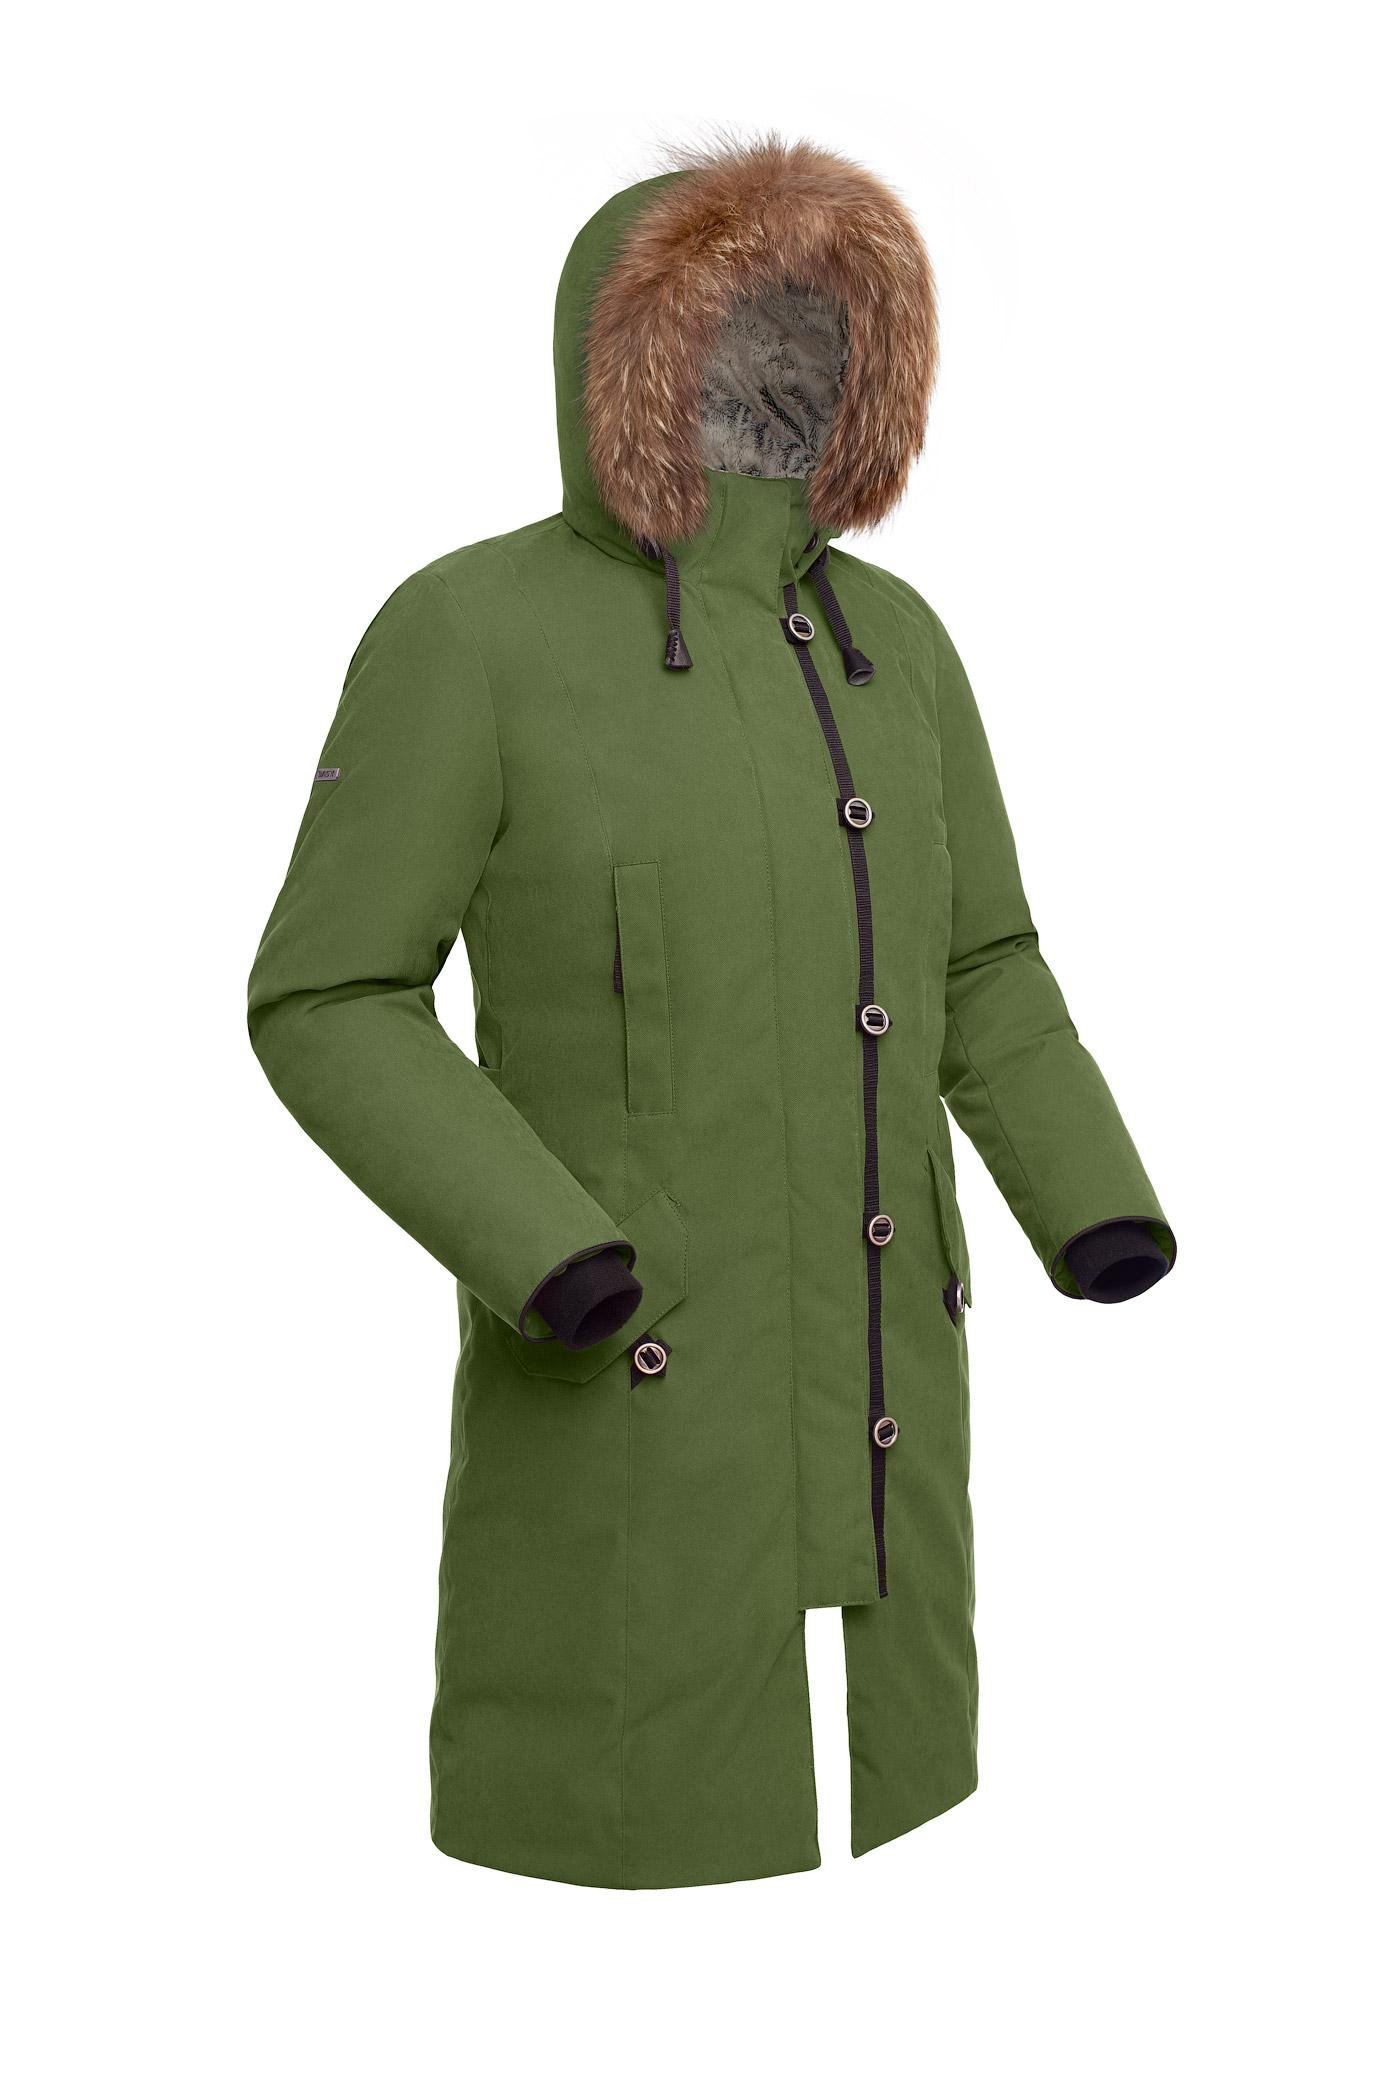 Пальто пуховое женское BASK HATANGA V2 хаки светлый, Пальто - арт. 971290409